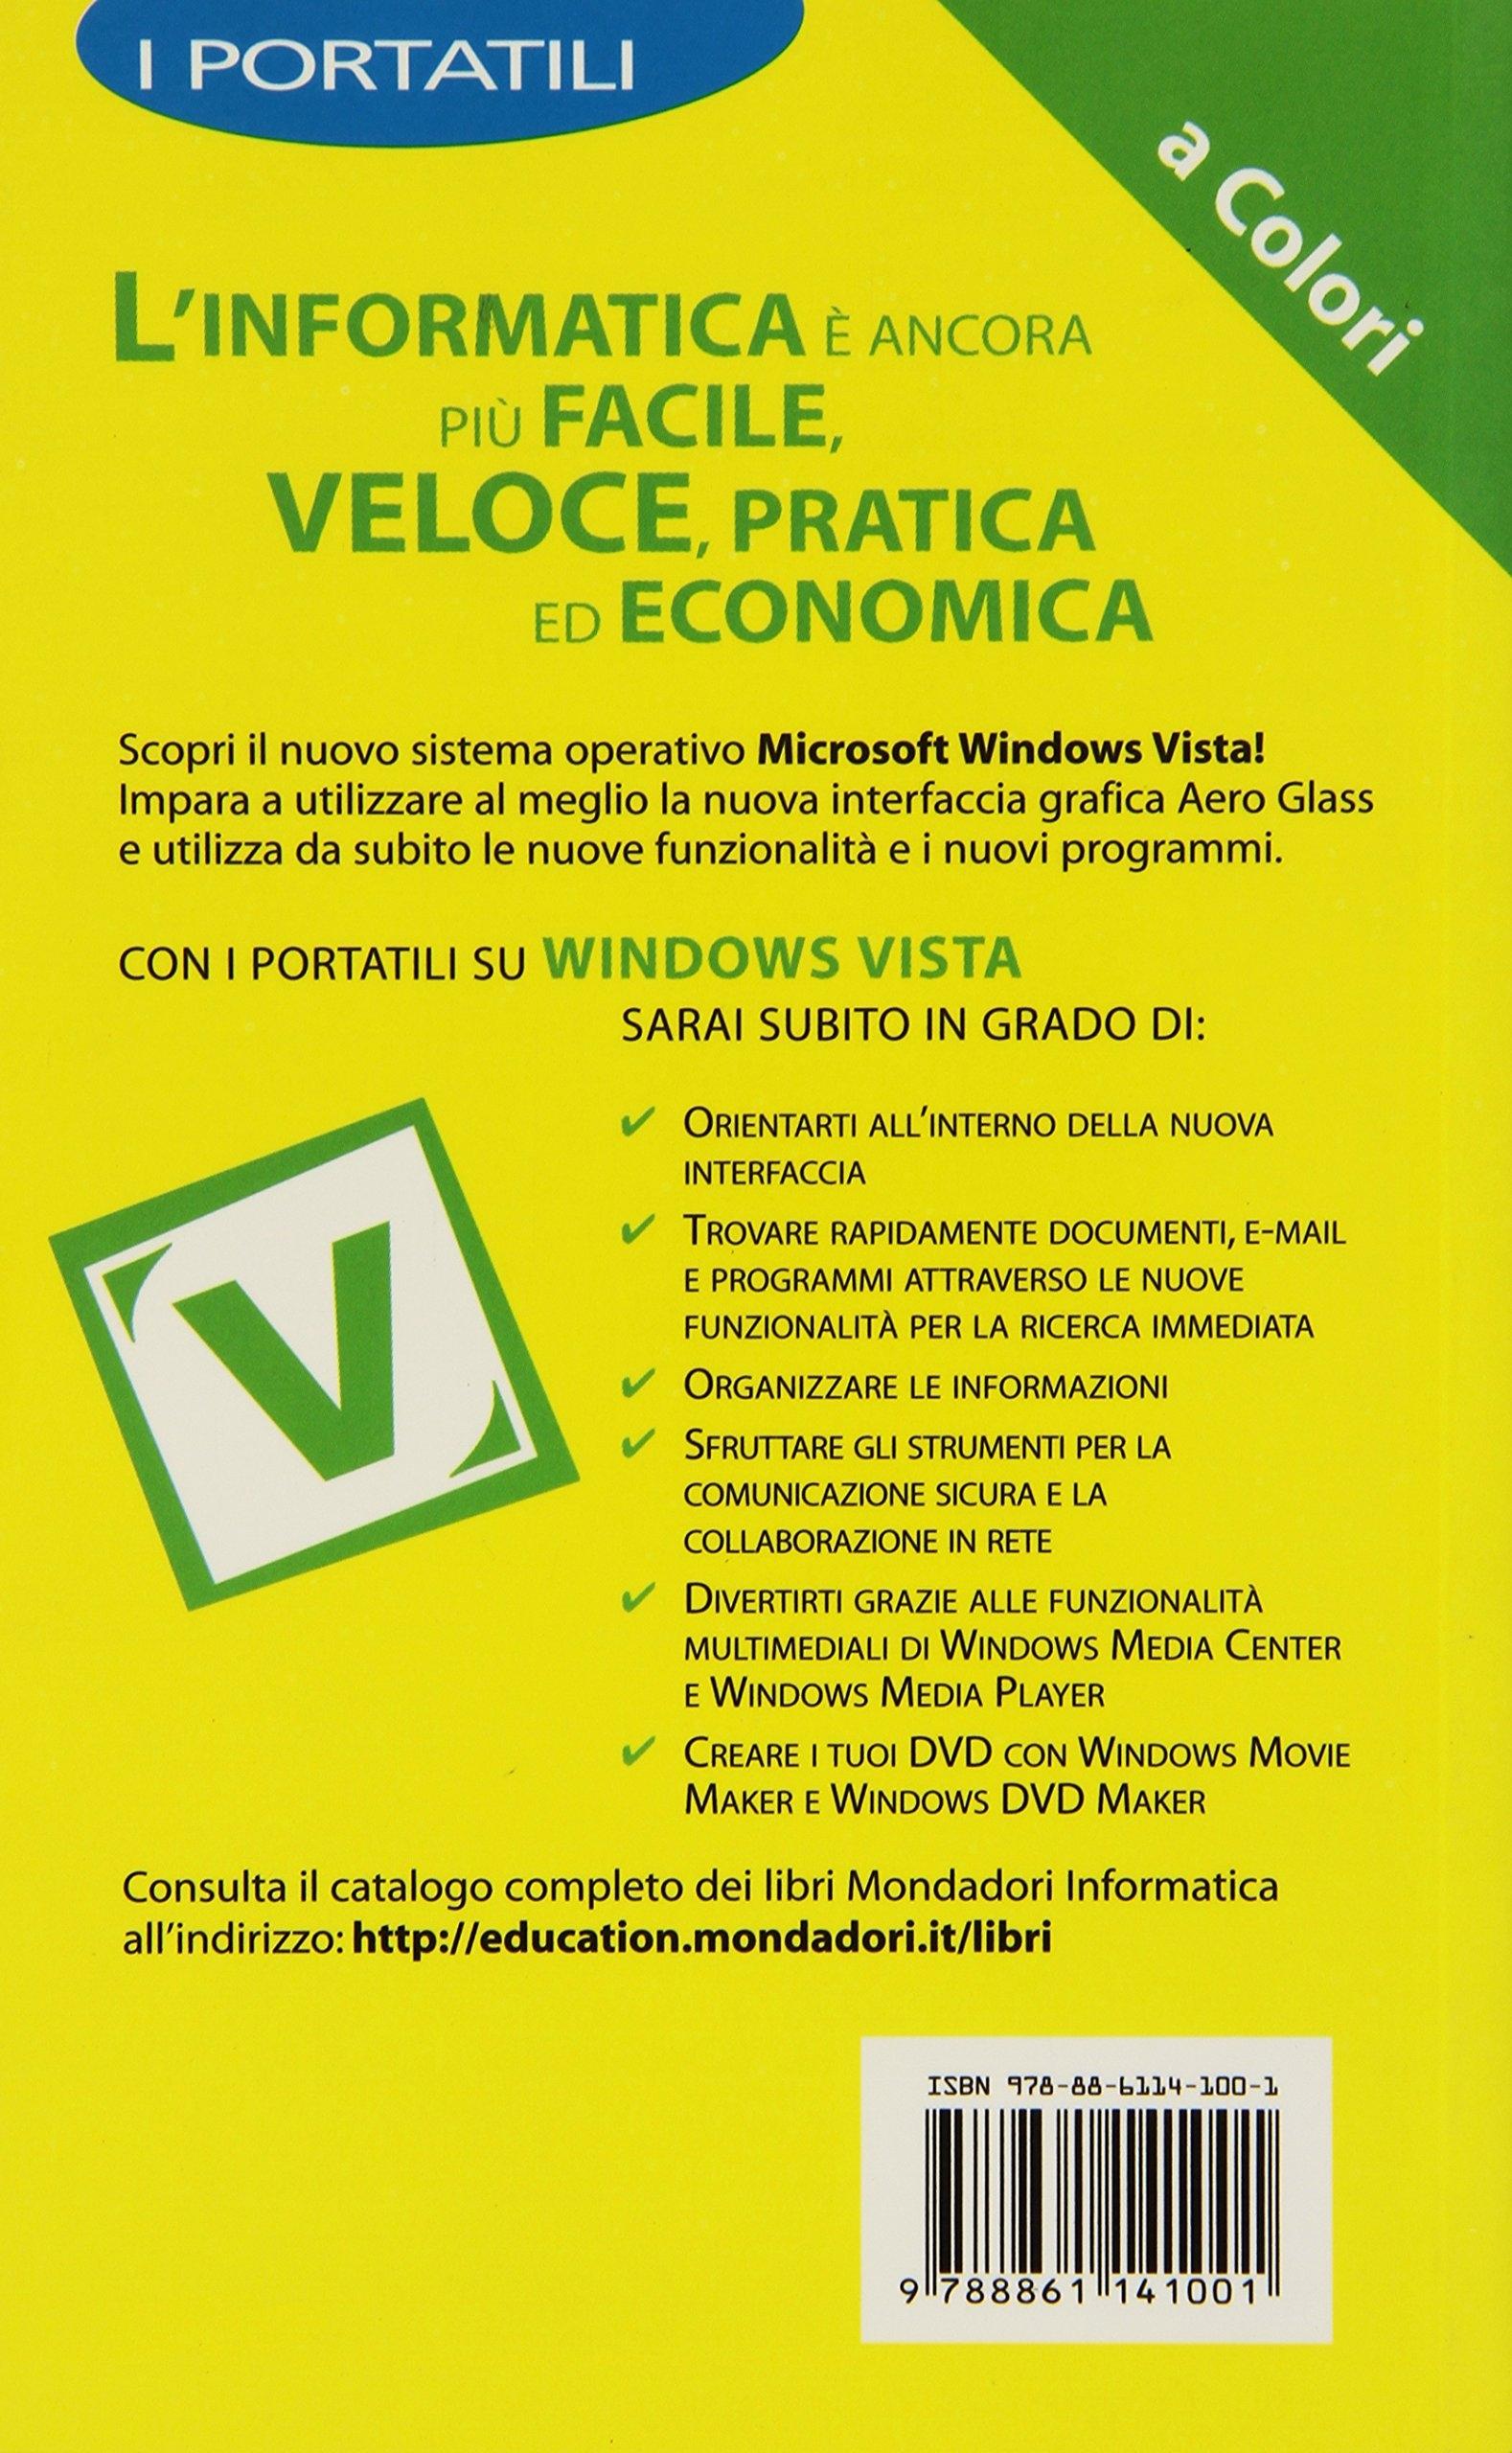 Microsoft Windows Vista. I portatili a colori.